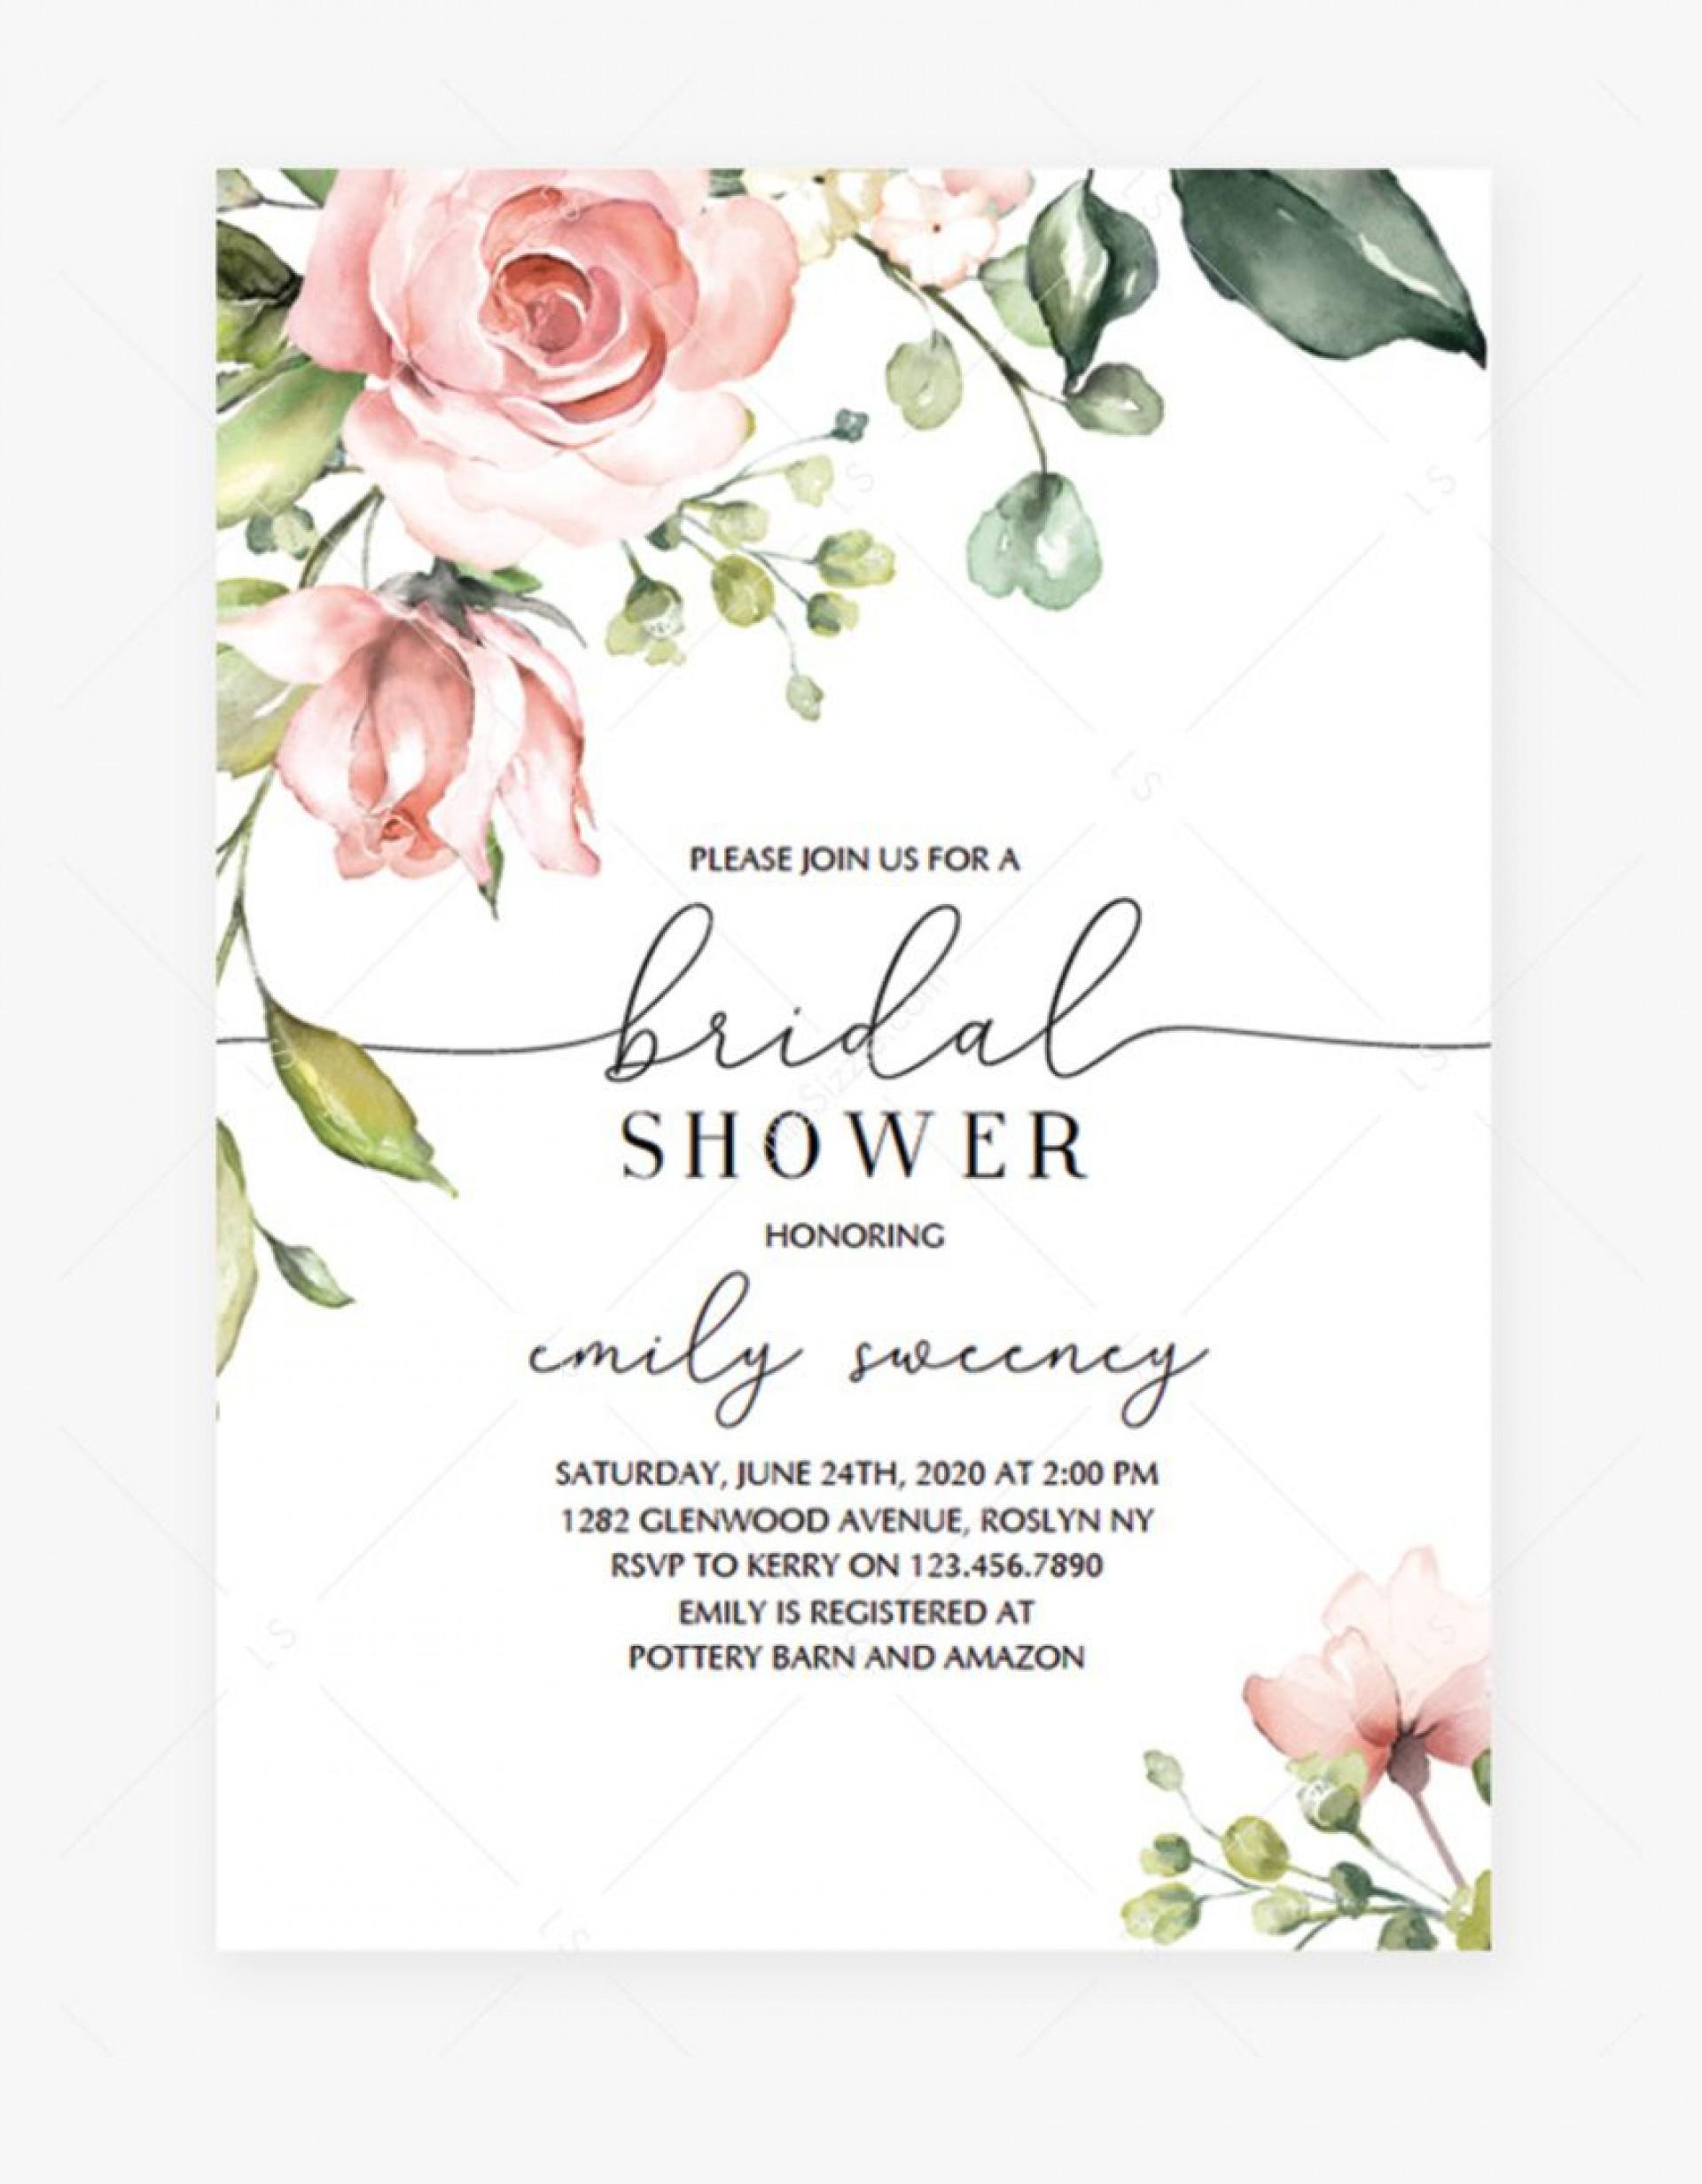 004 Beautiful Free Bridal Shower Invite Template Highest Clarity  Invitation For Word Wedding Microsoft1920